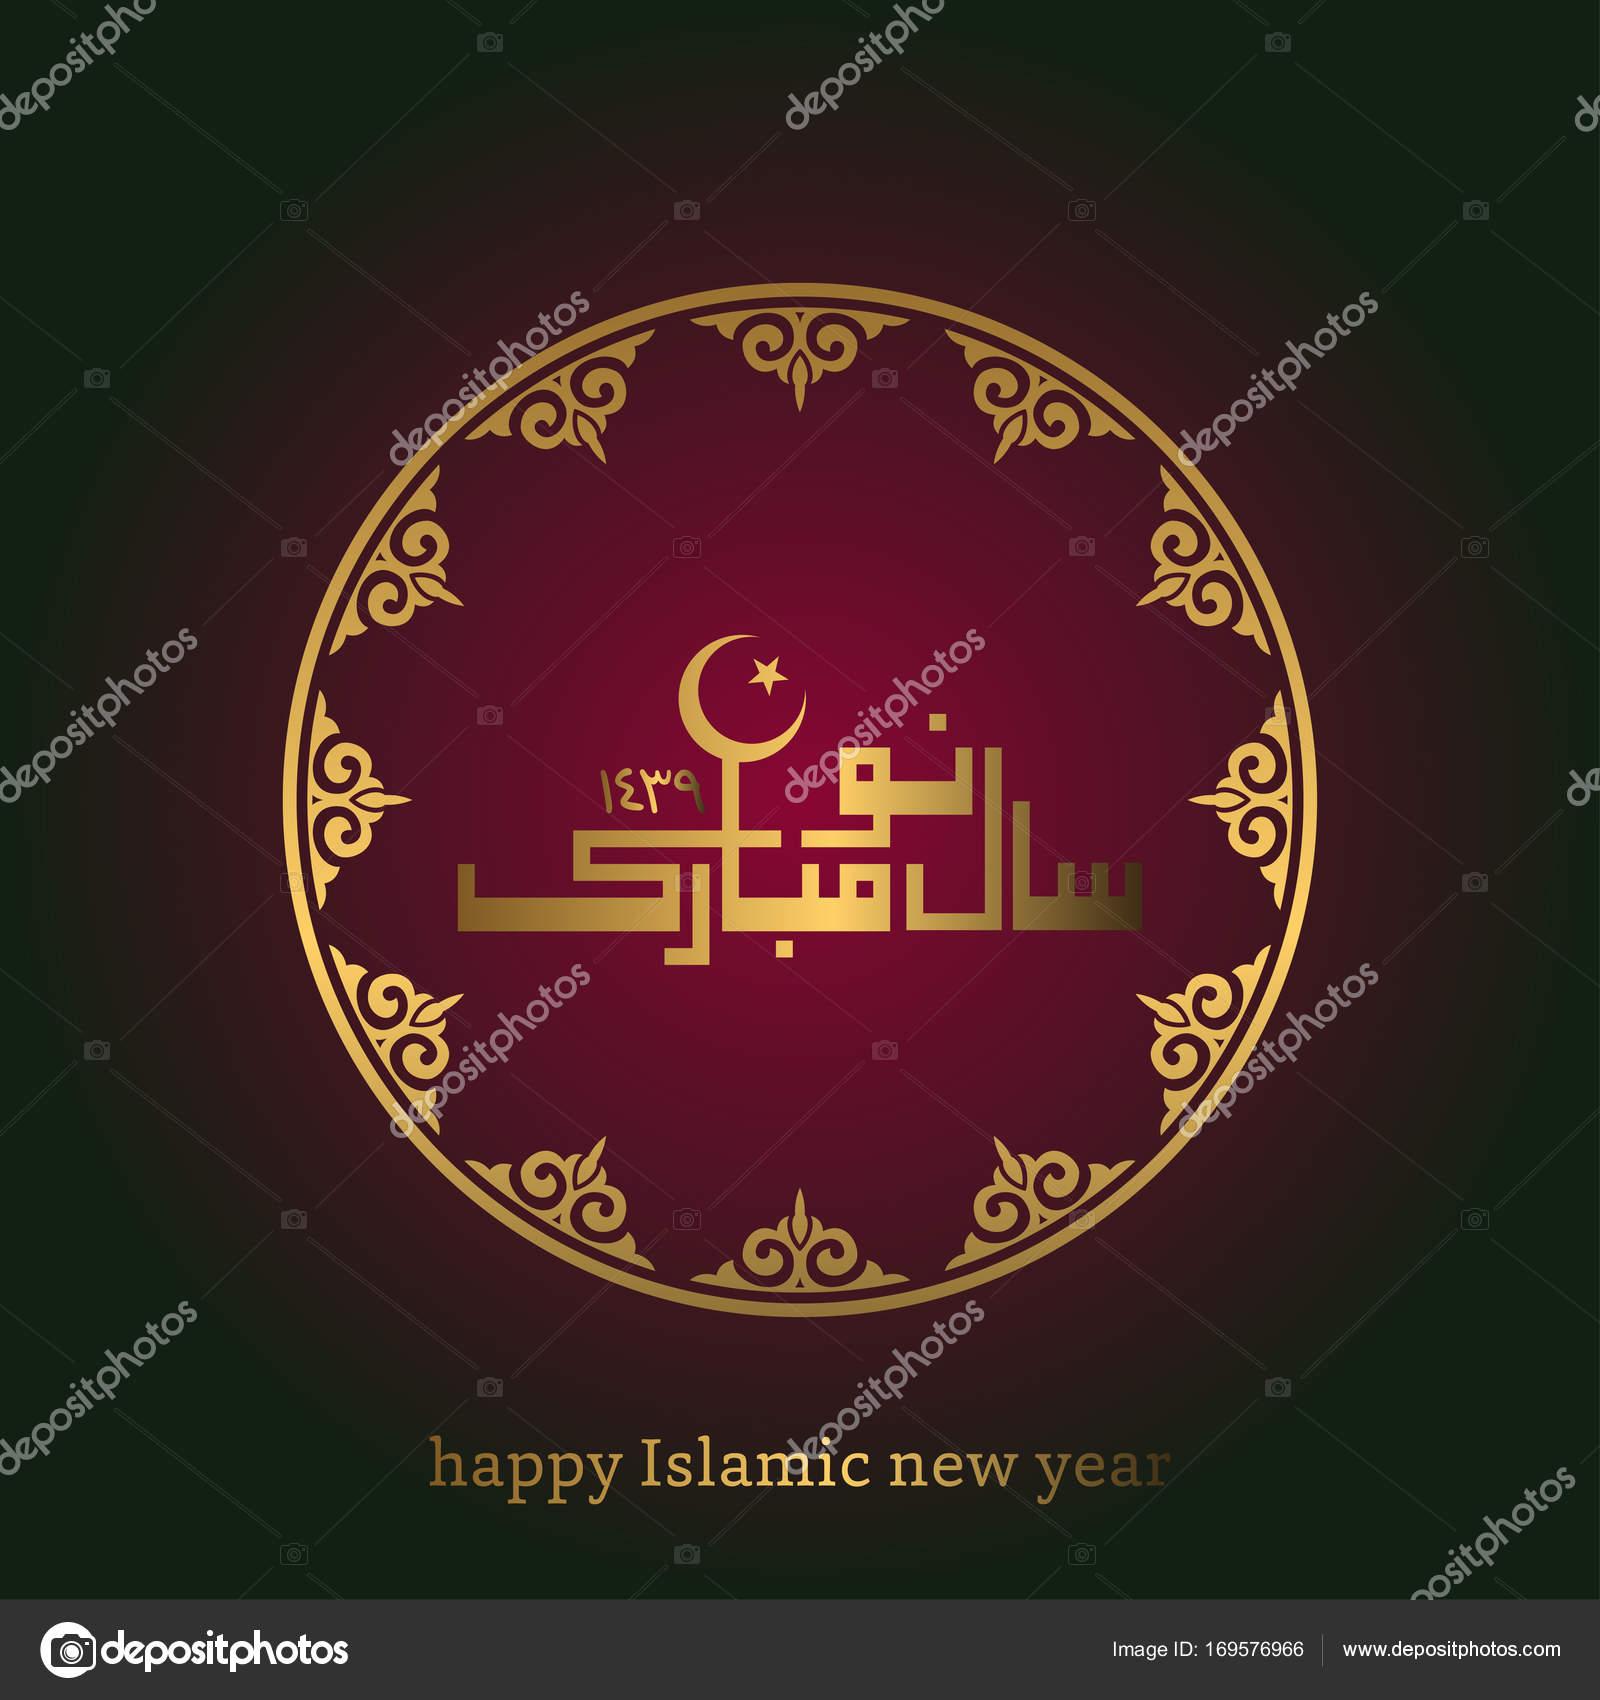 Greeting Card For Islamic New Year Stock Vector Ibrandify 169576966